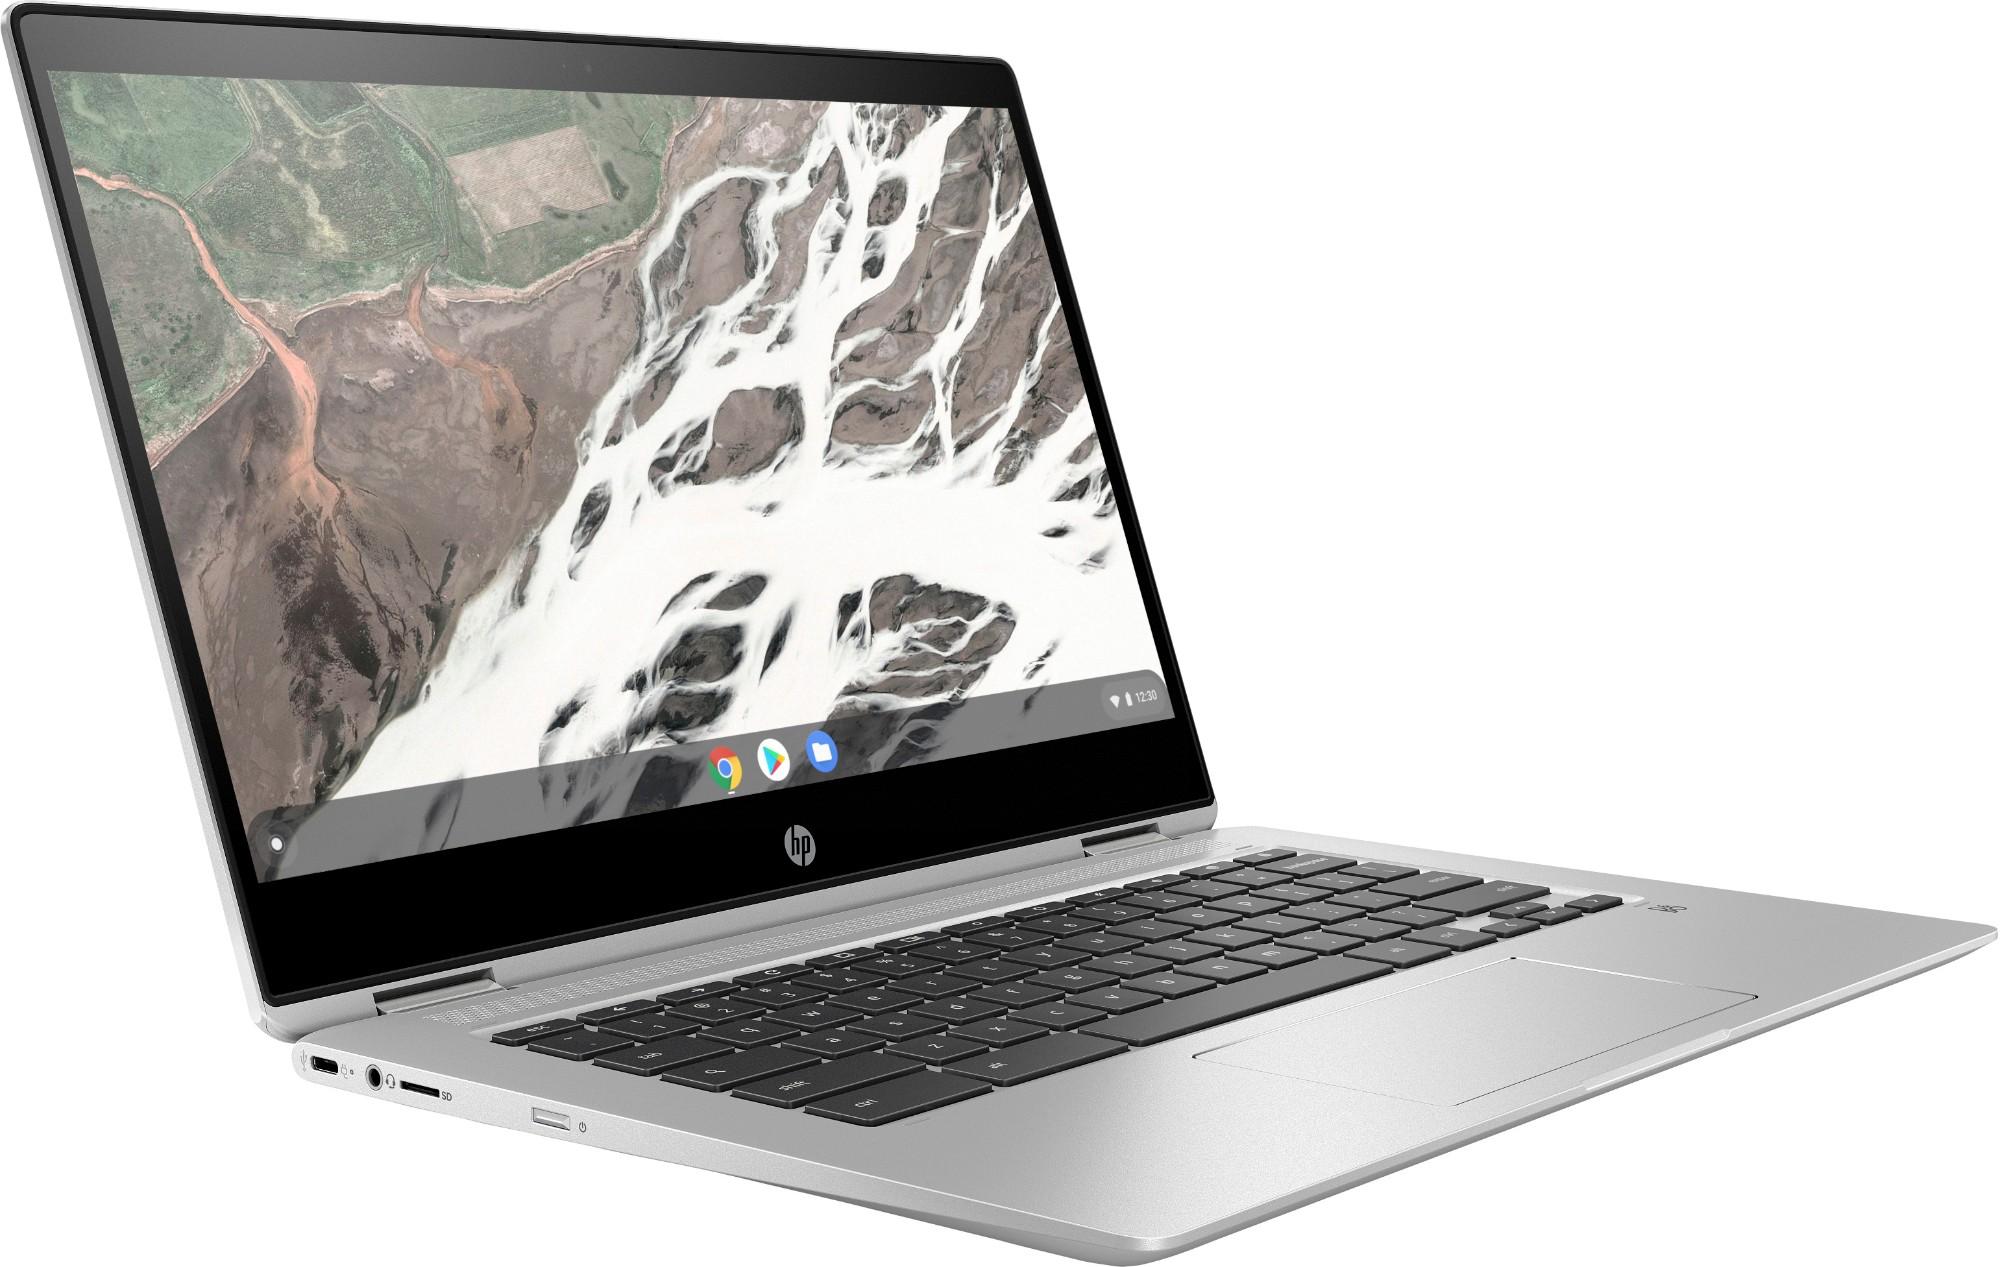 HP Chromebook x360 14 G1 Silver 35 6 cm (14